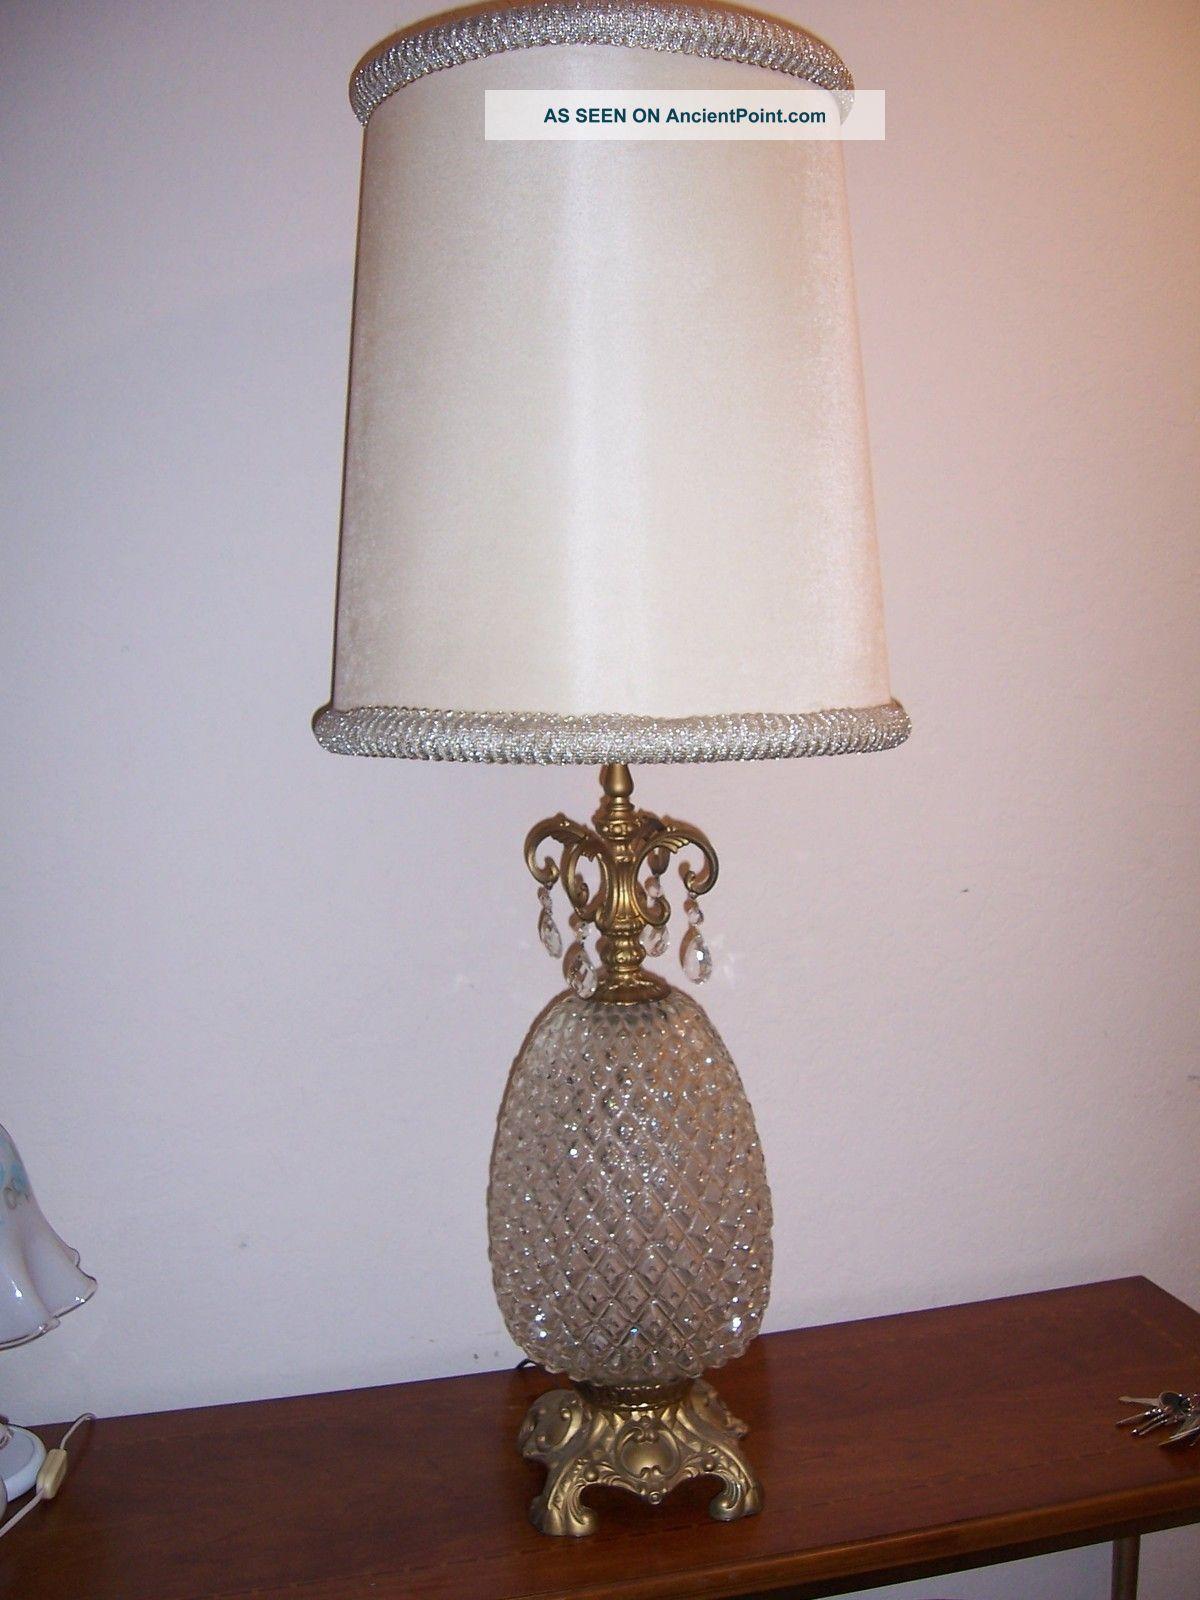 a lamp pair pin lobbies leaf italian leaves pineapple gold table